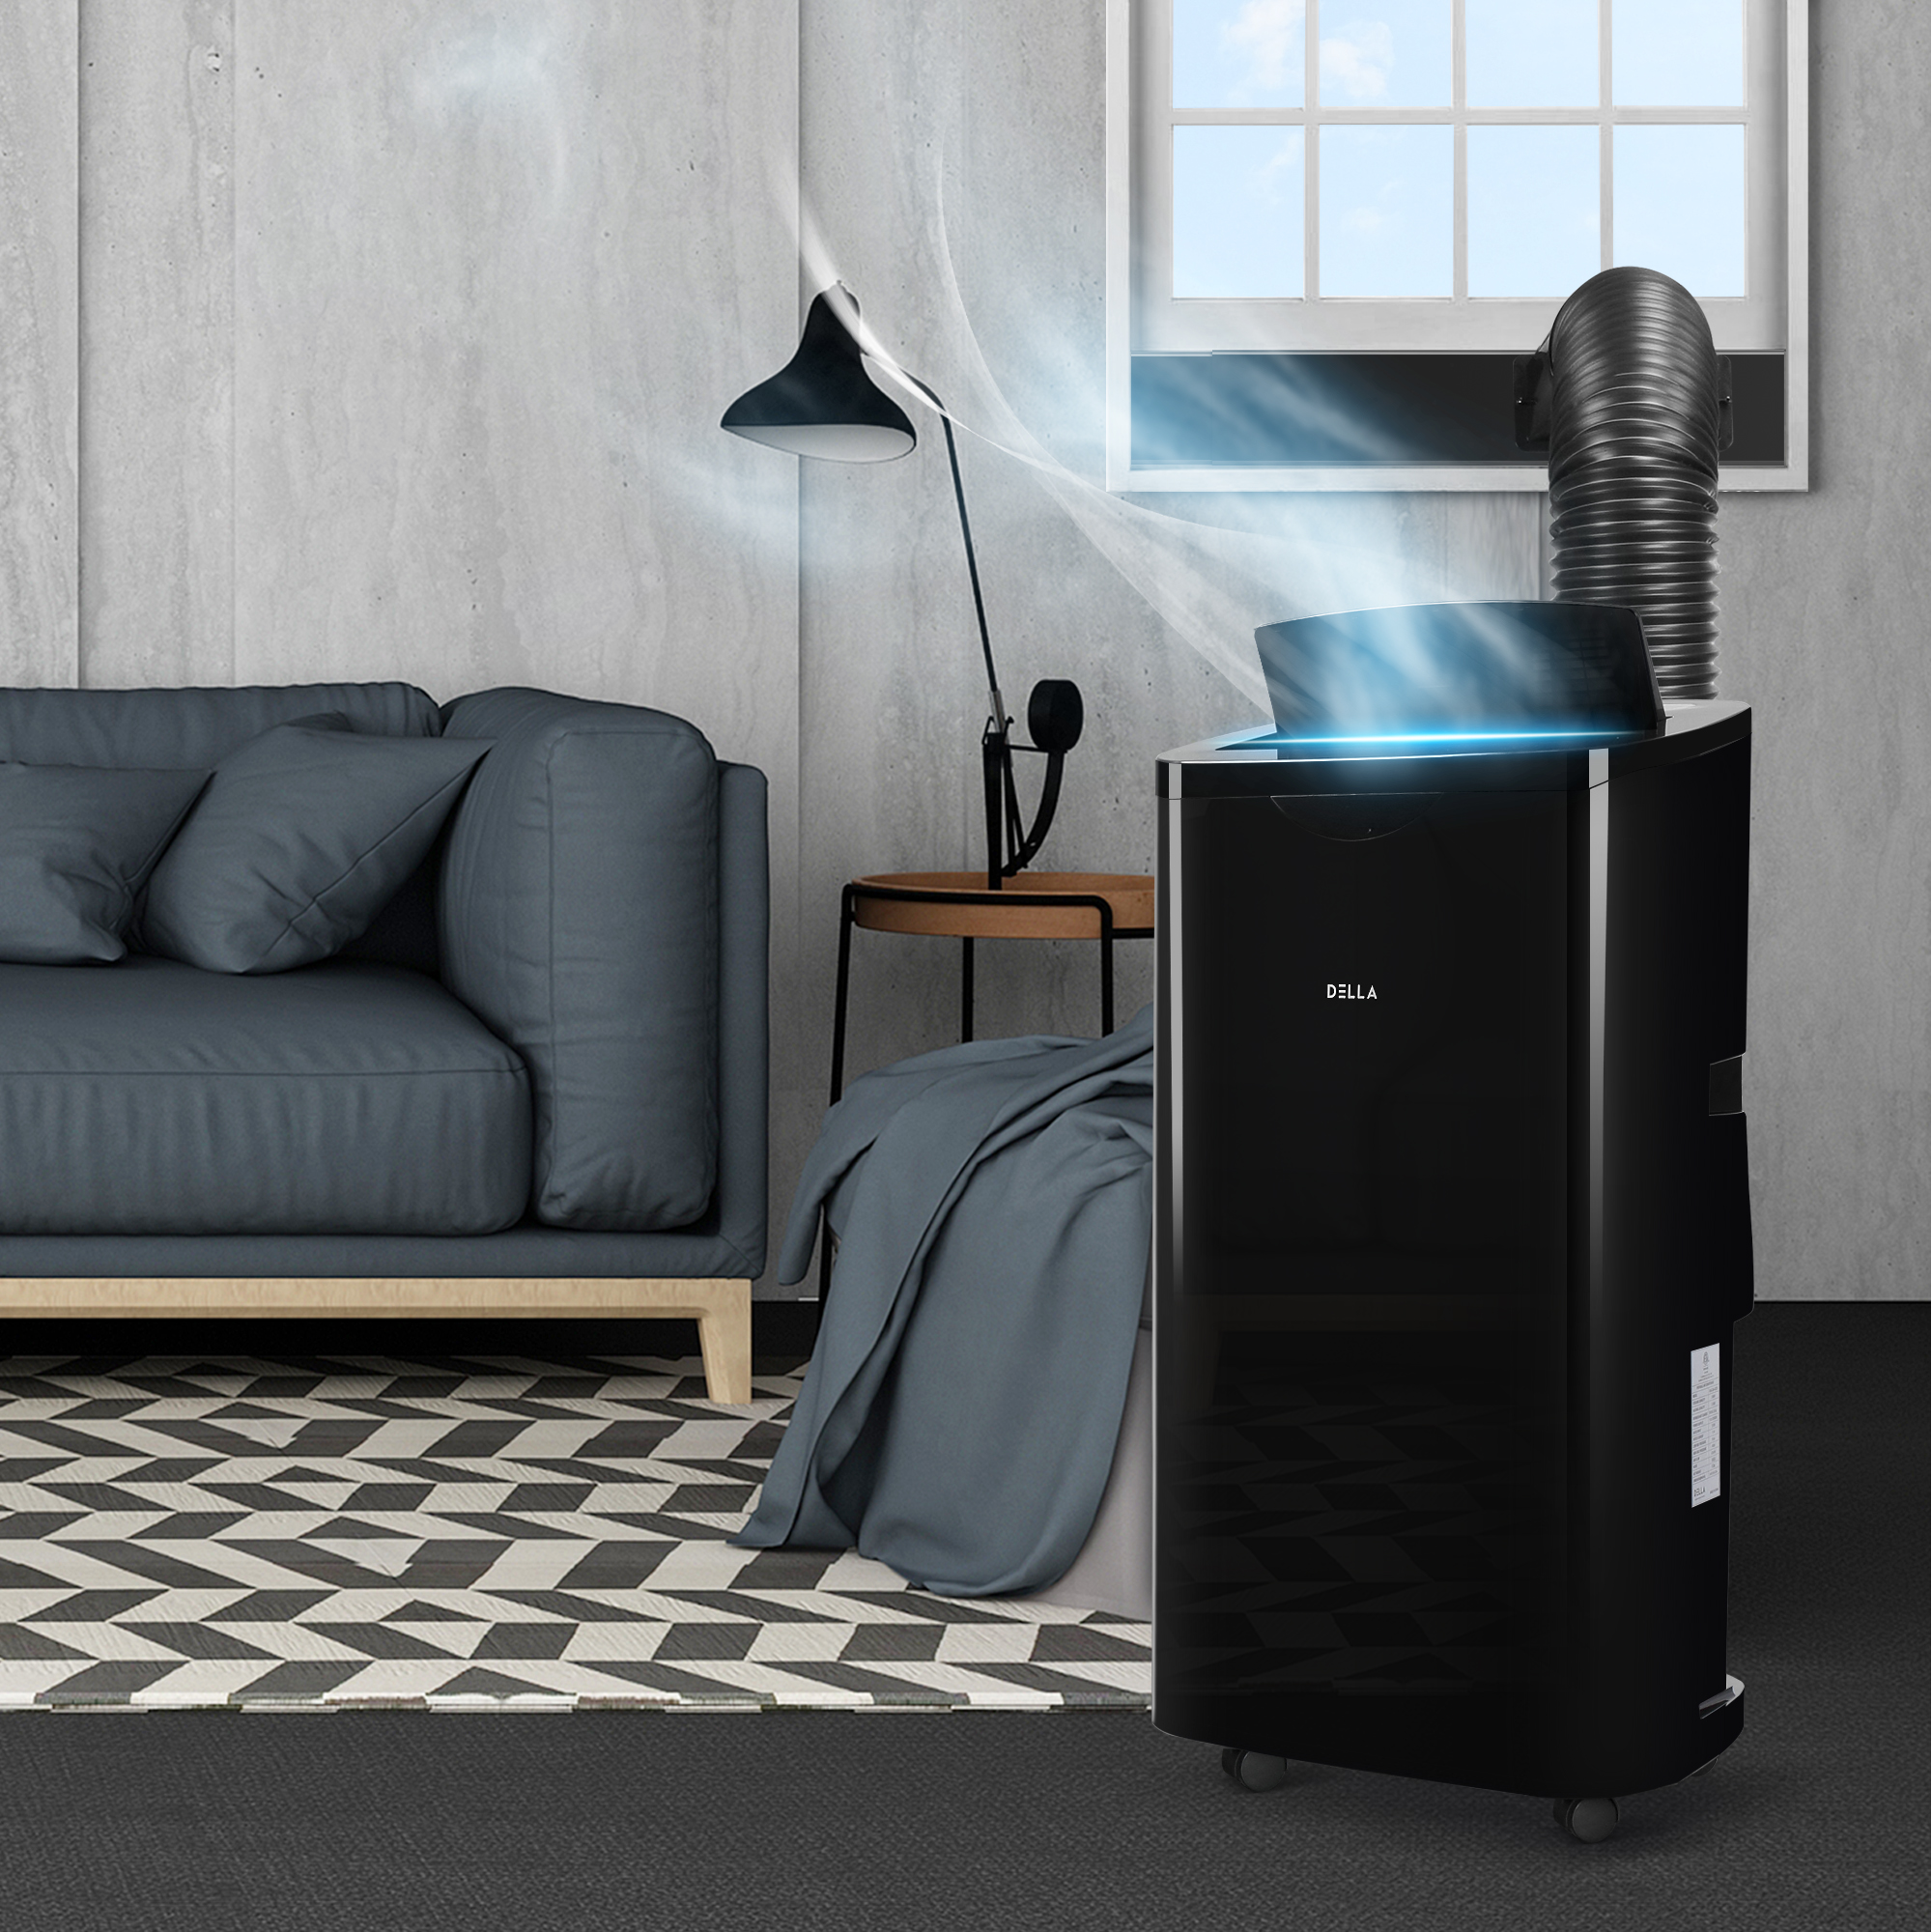 Details about DELLA 14000 BTU Portable A/C Air Conditioner + 1050W Heater +  Dehumidifier + Fan